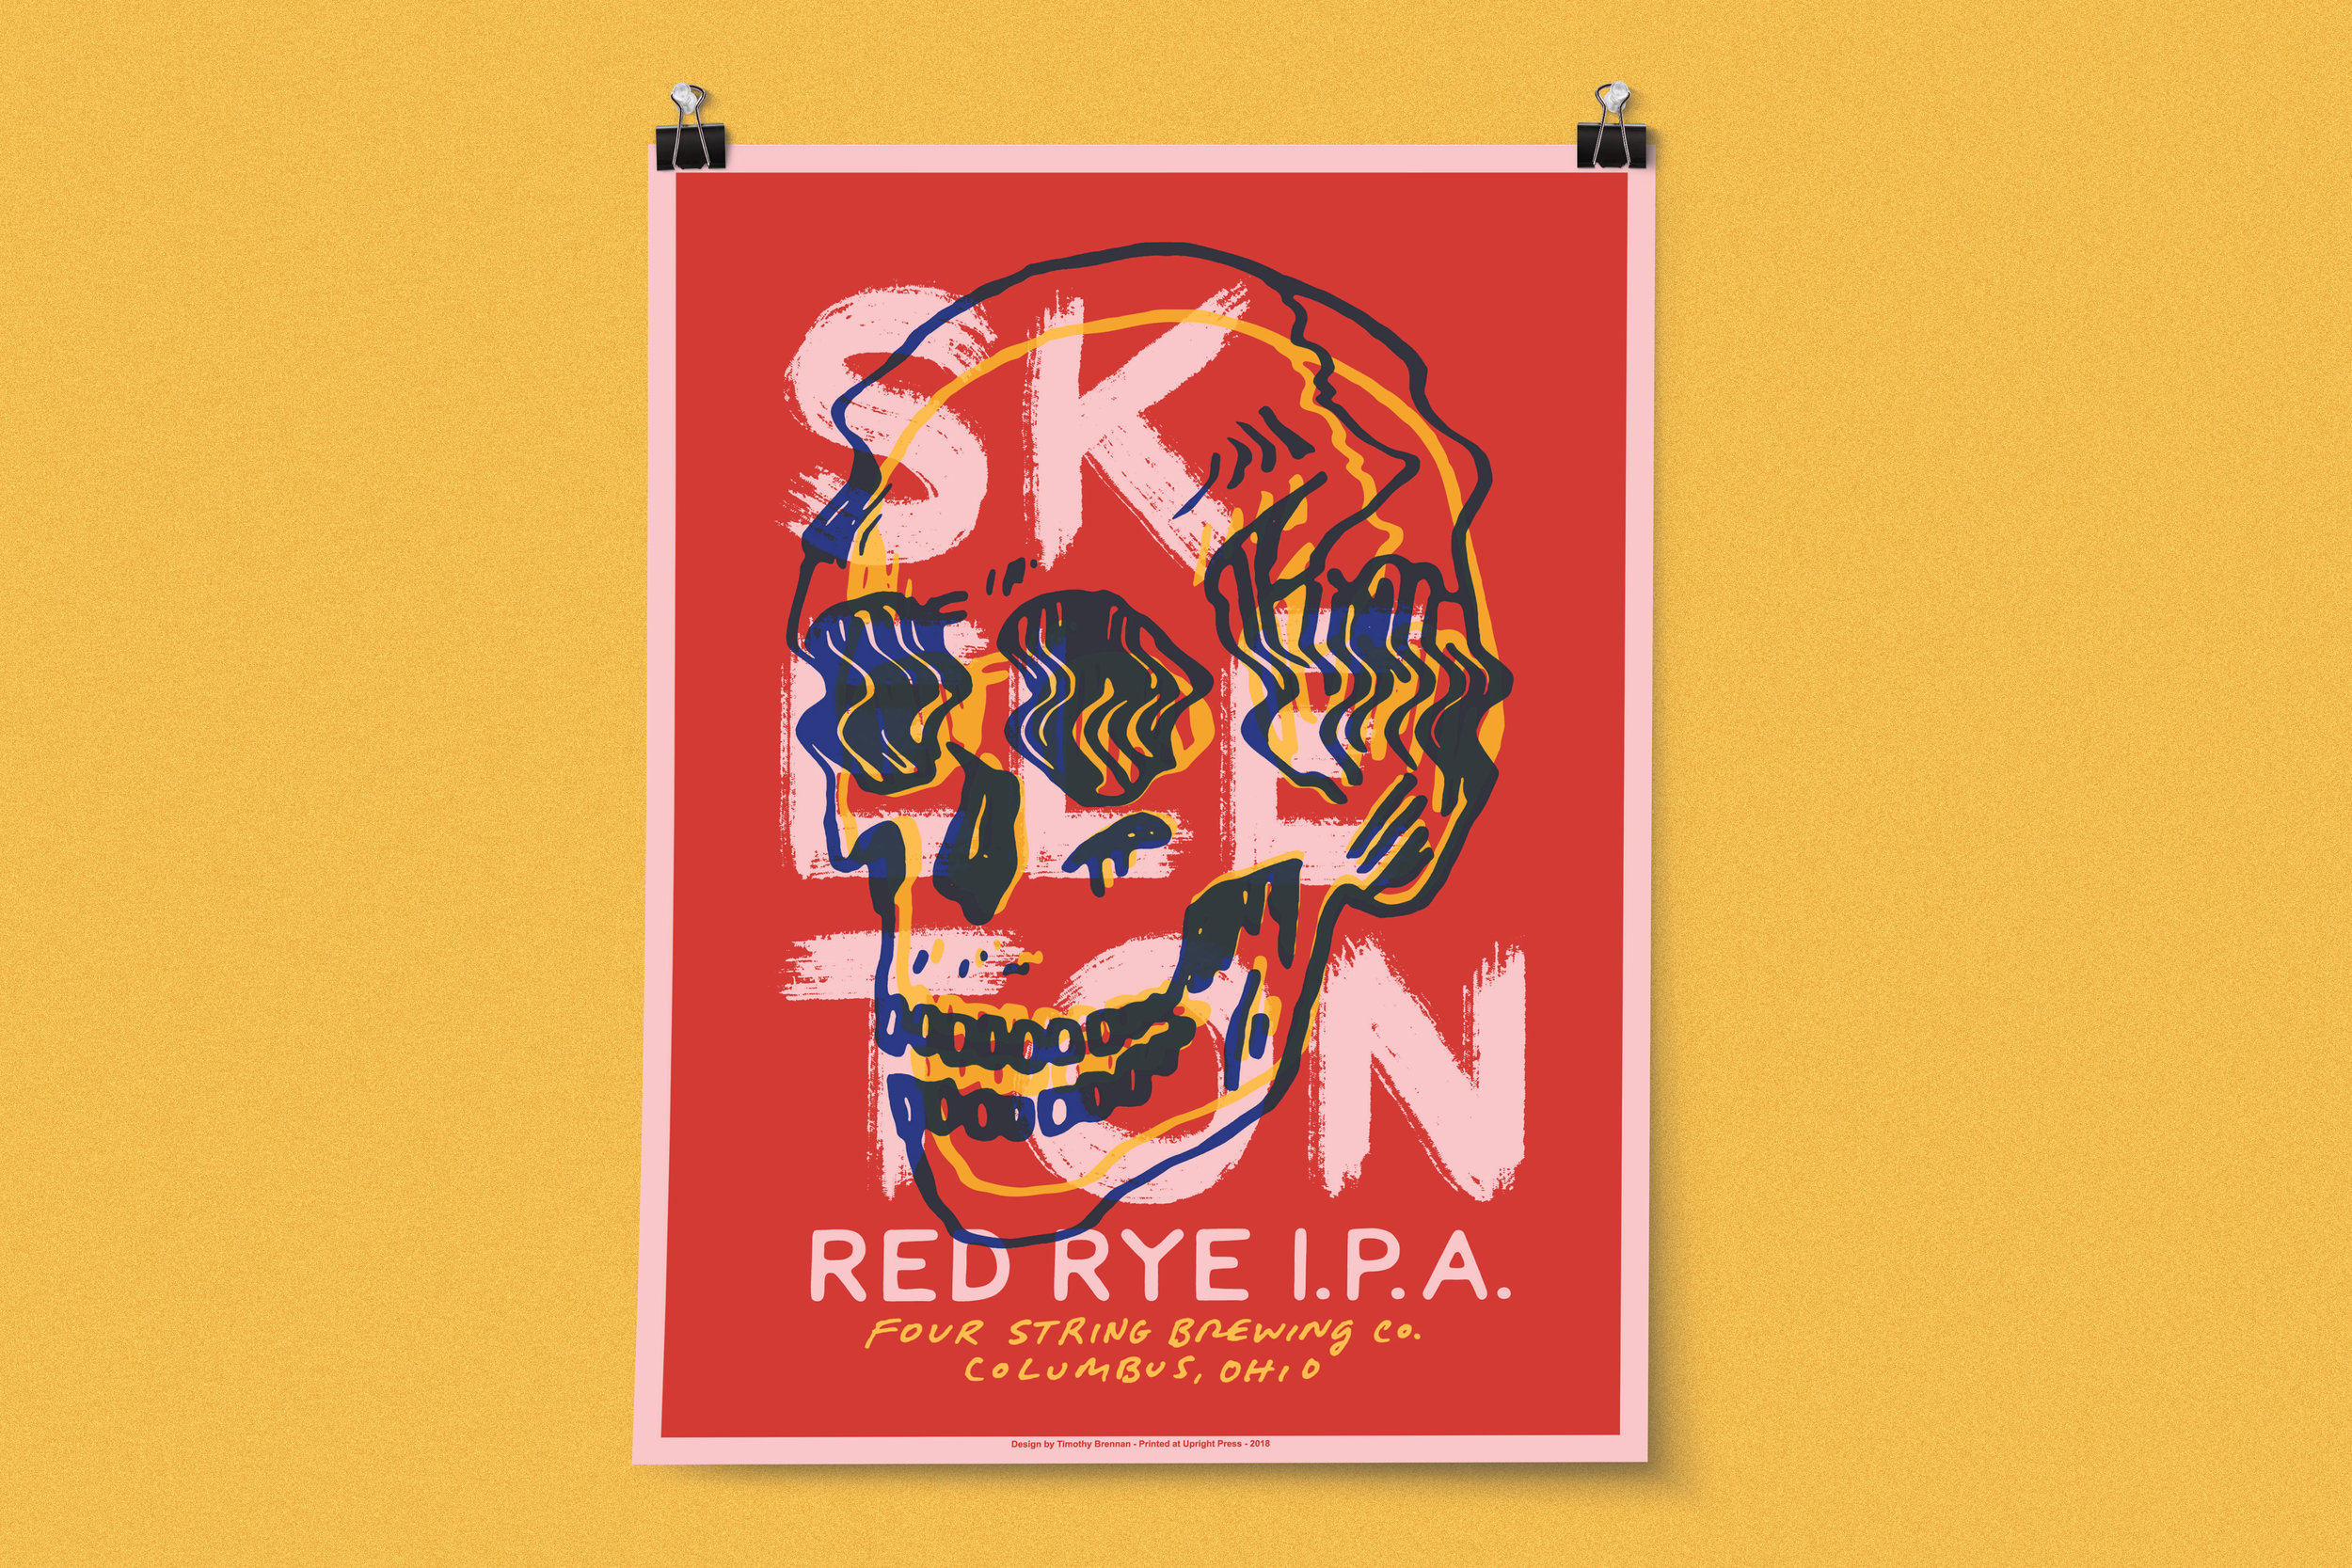 TB_Skeleton Red Rye_Poster_mockup_yellow.jpg